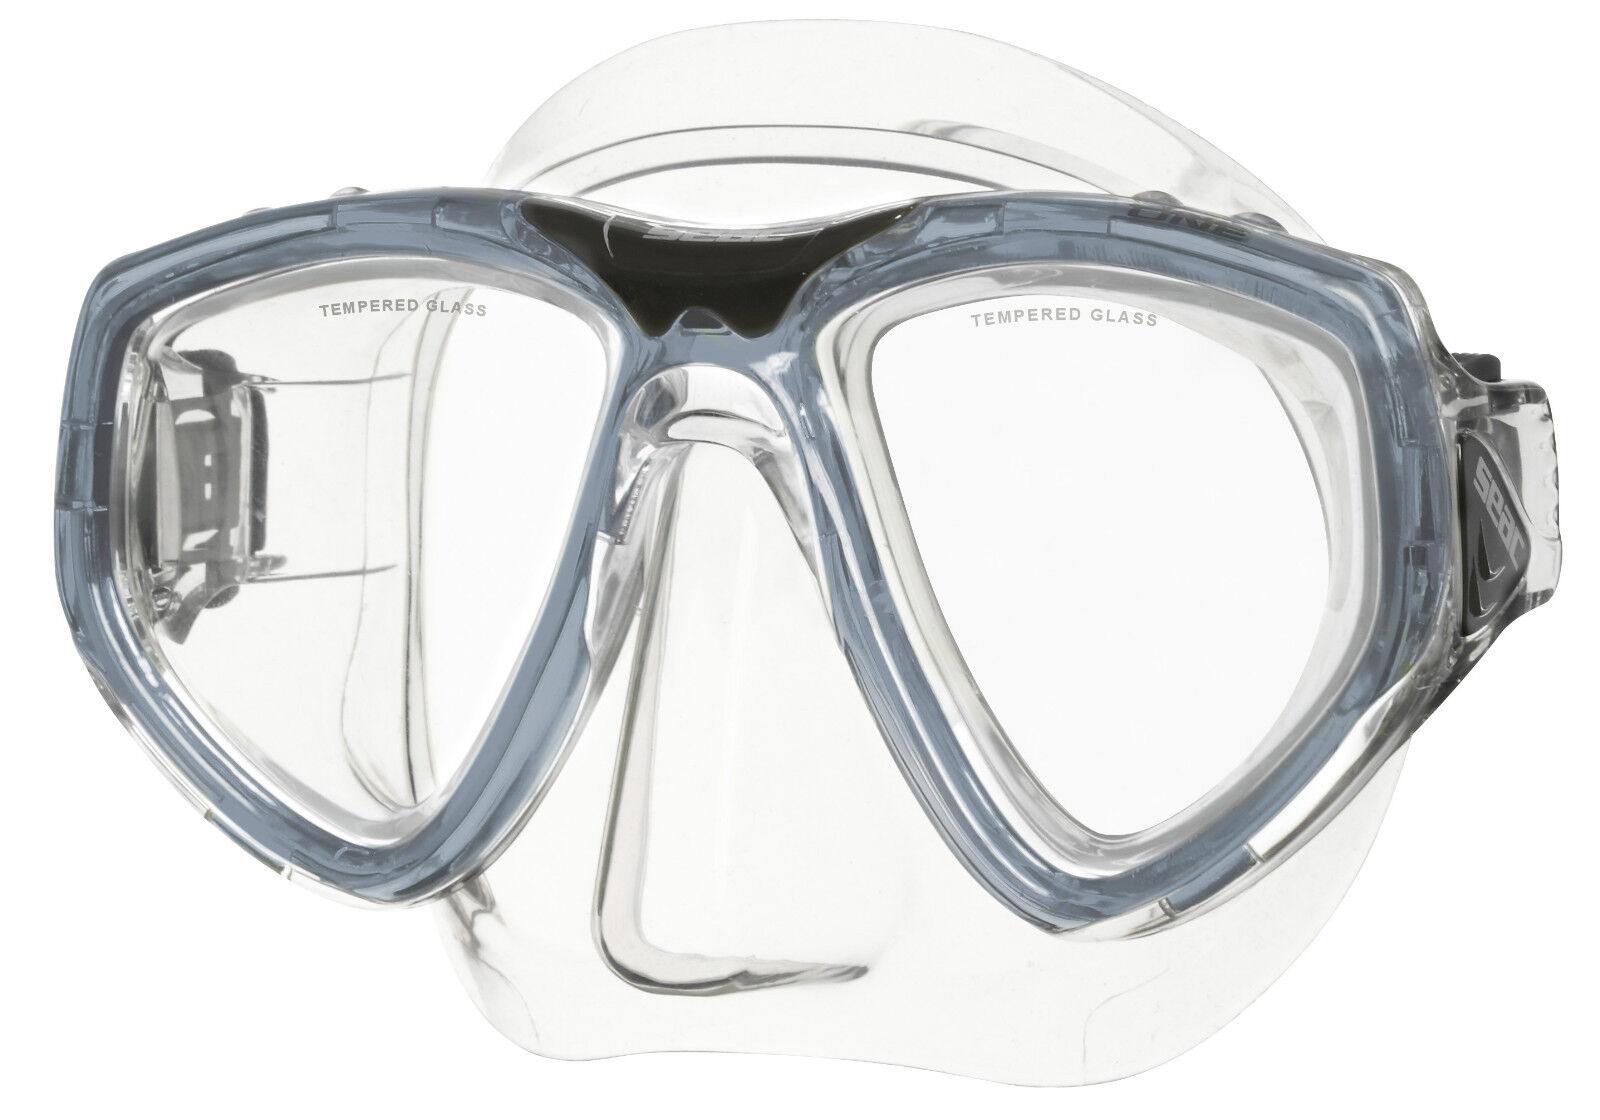 Tauchmaske ONE ONE ONE von SeacSub, Apnoe- Maske, Schnorchelmaske 50ee2c